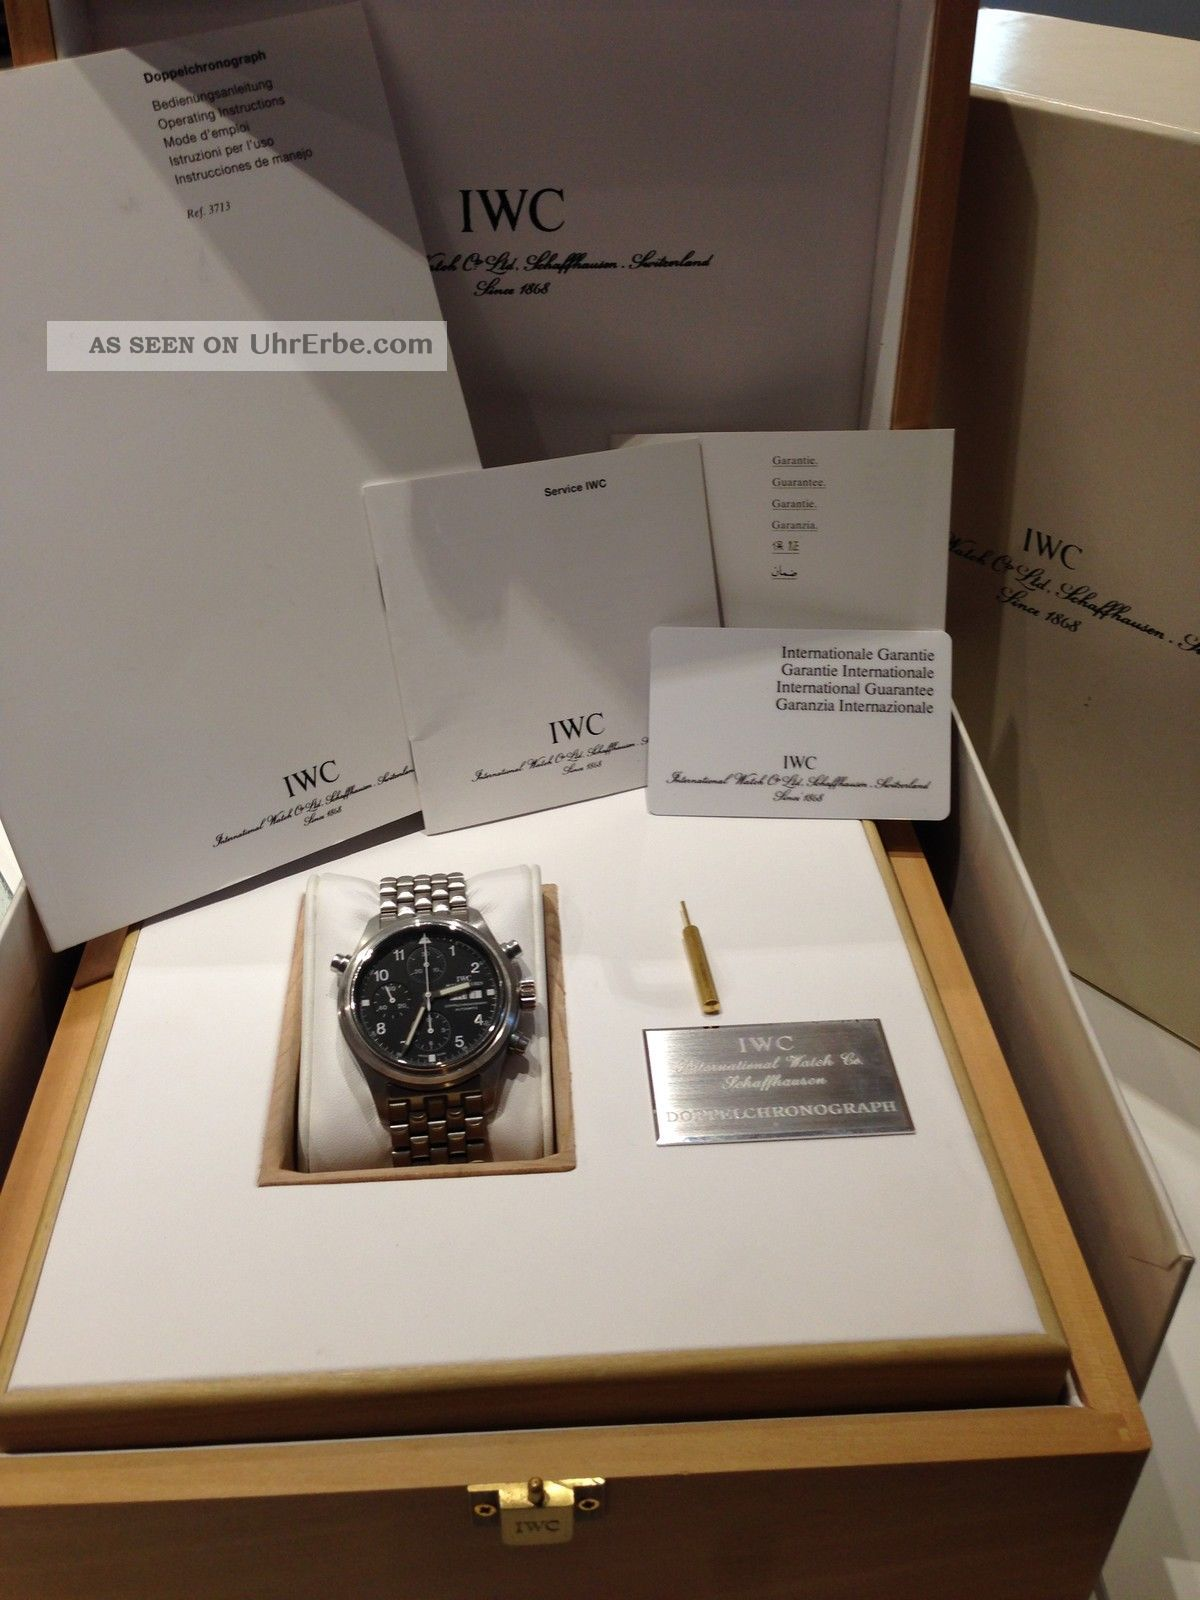 Iwc 3713 Doppelchronograph Komplettes Paket In Aus 1.  Hand Armbanduhren Bild